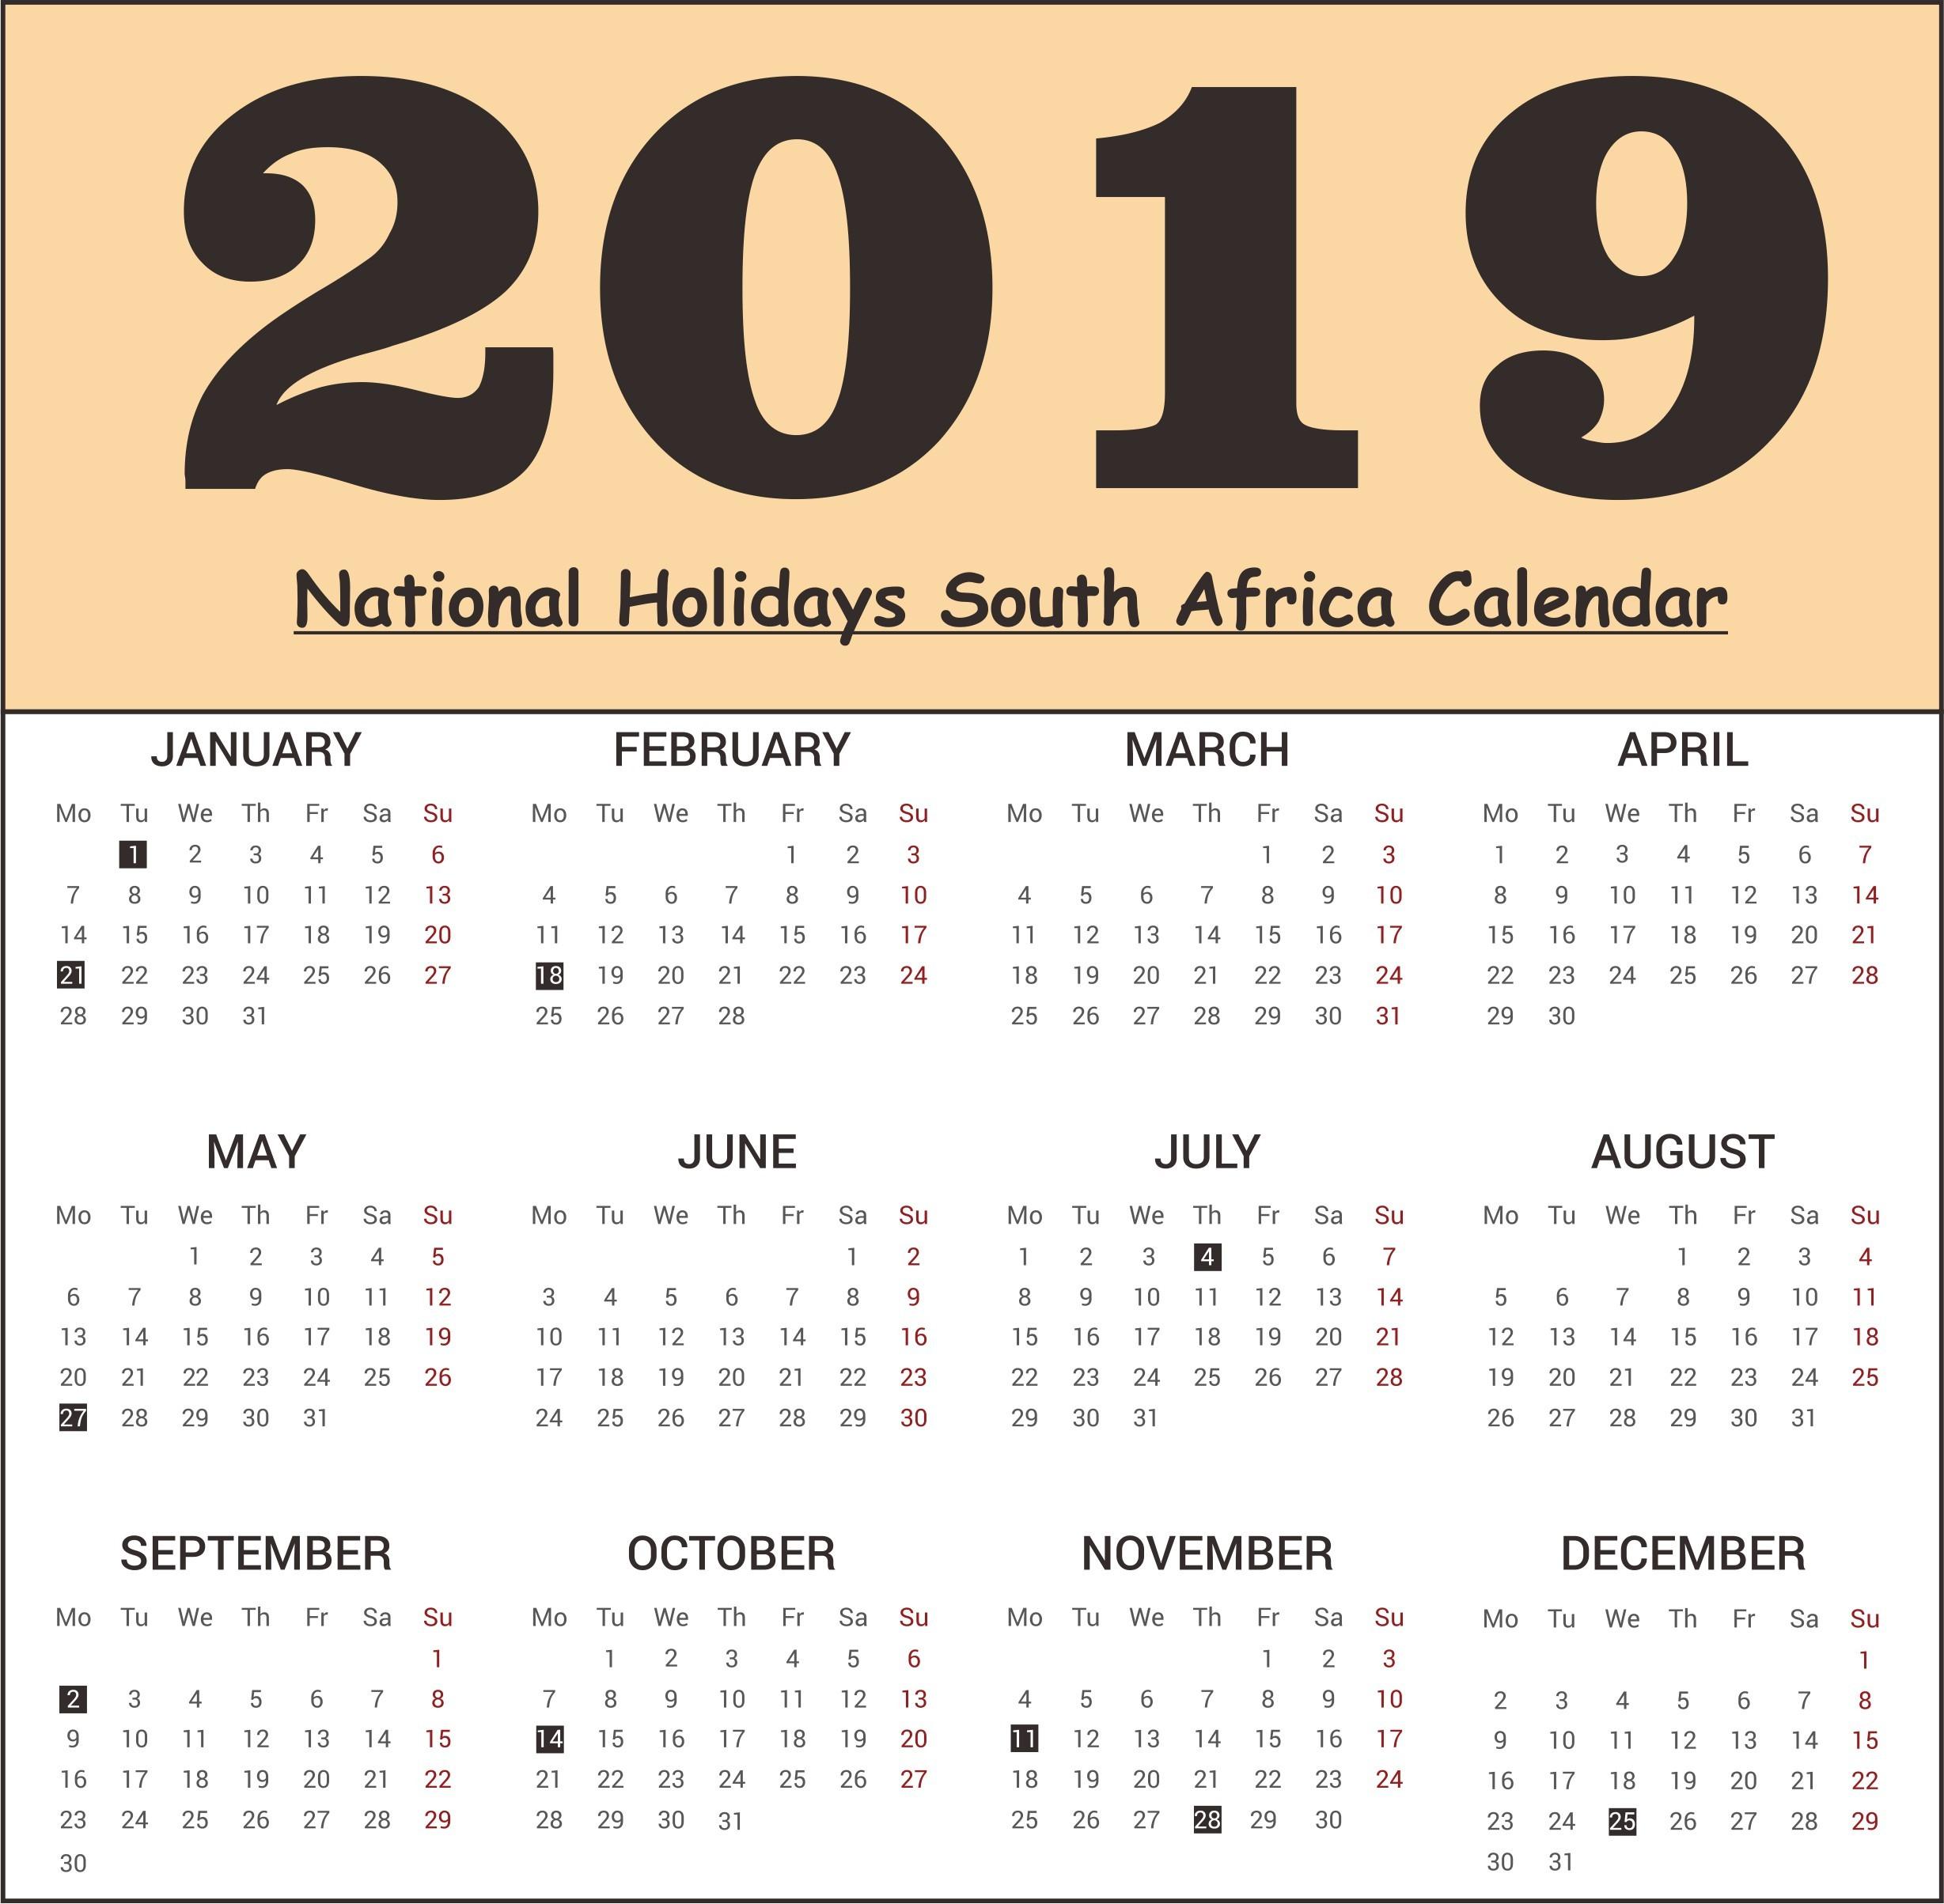 march 2019 calendar lala ramswaroop mas actual free calendar template 2019 australia of march 2019 calendar lala ramswaroop